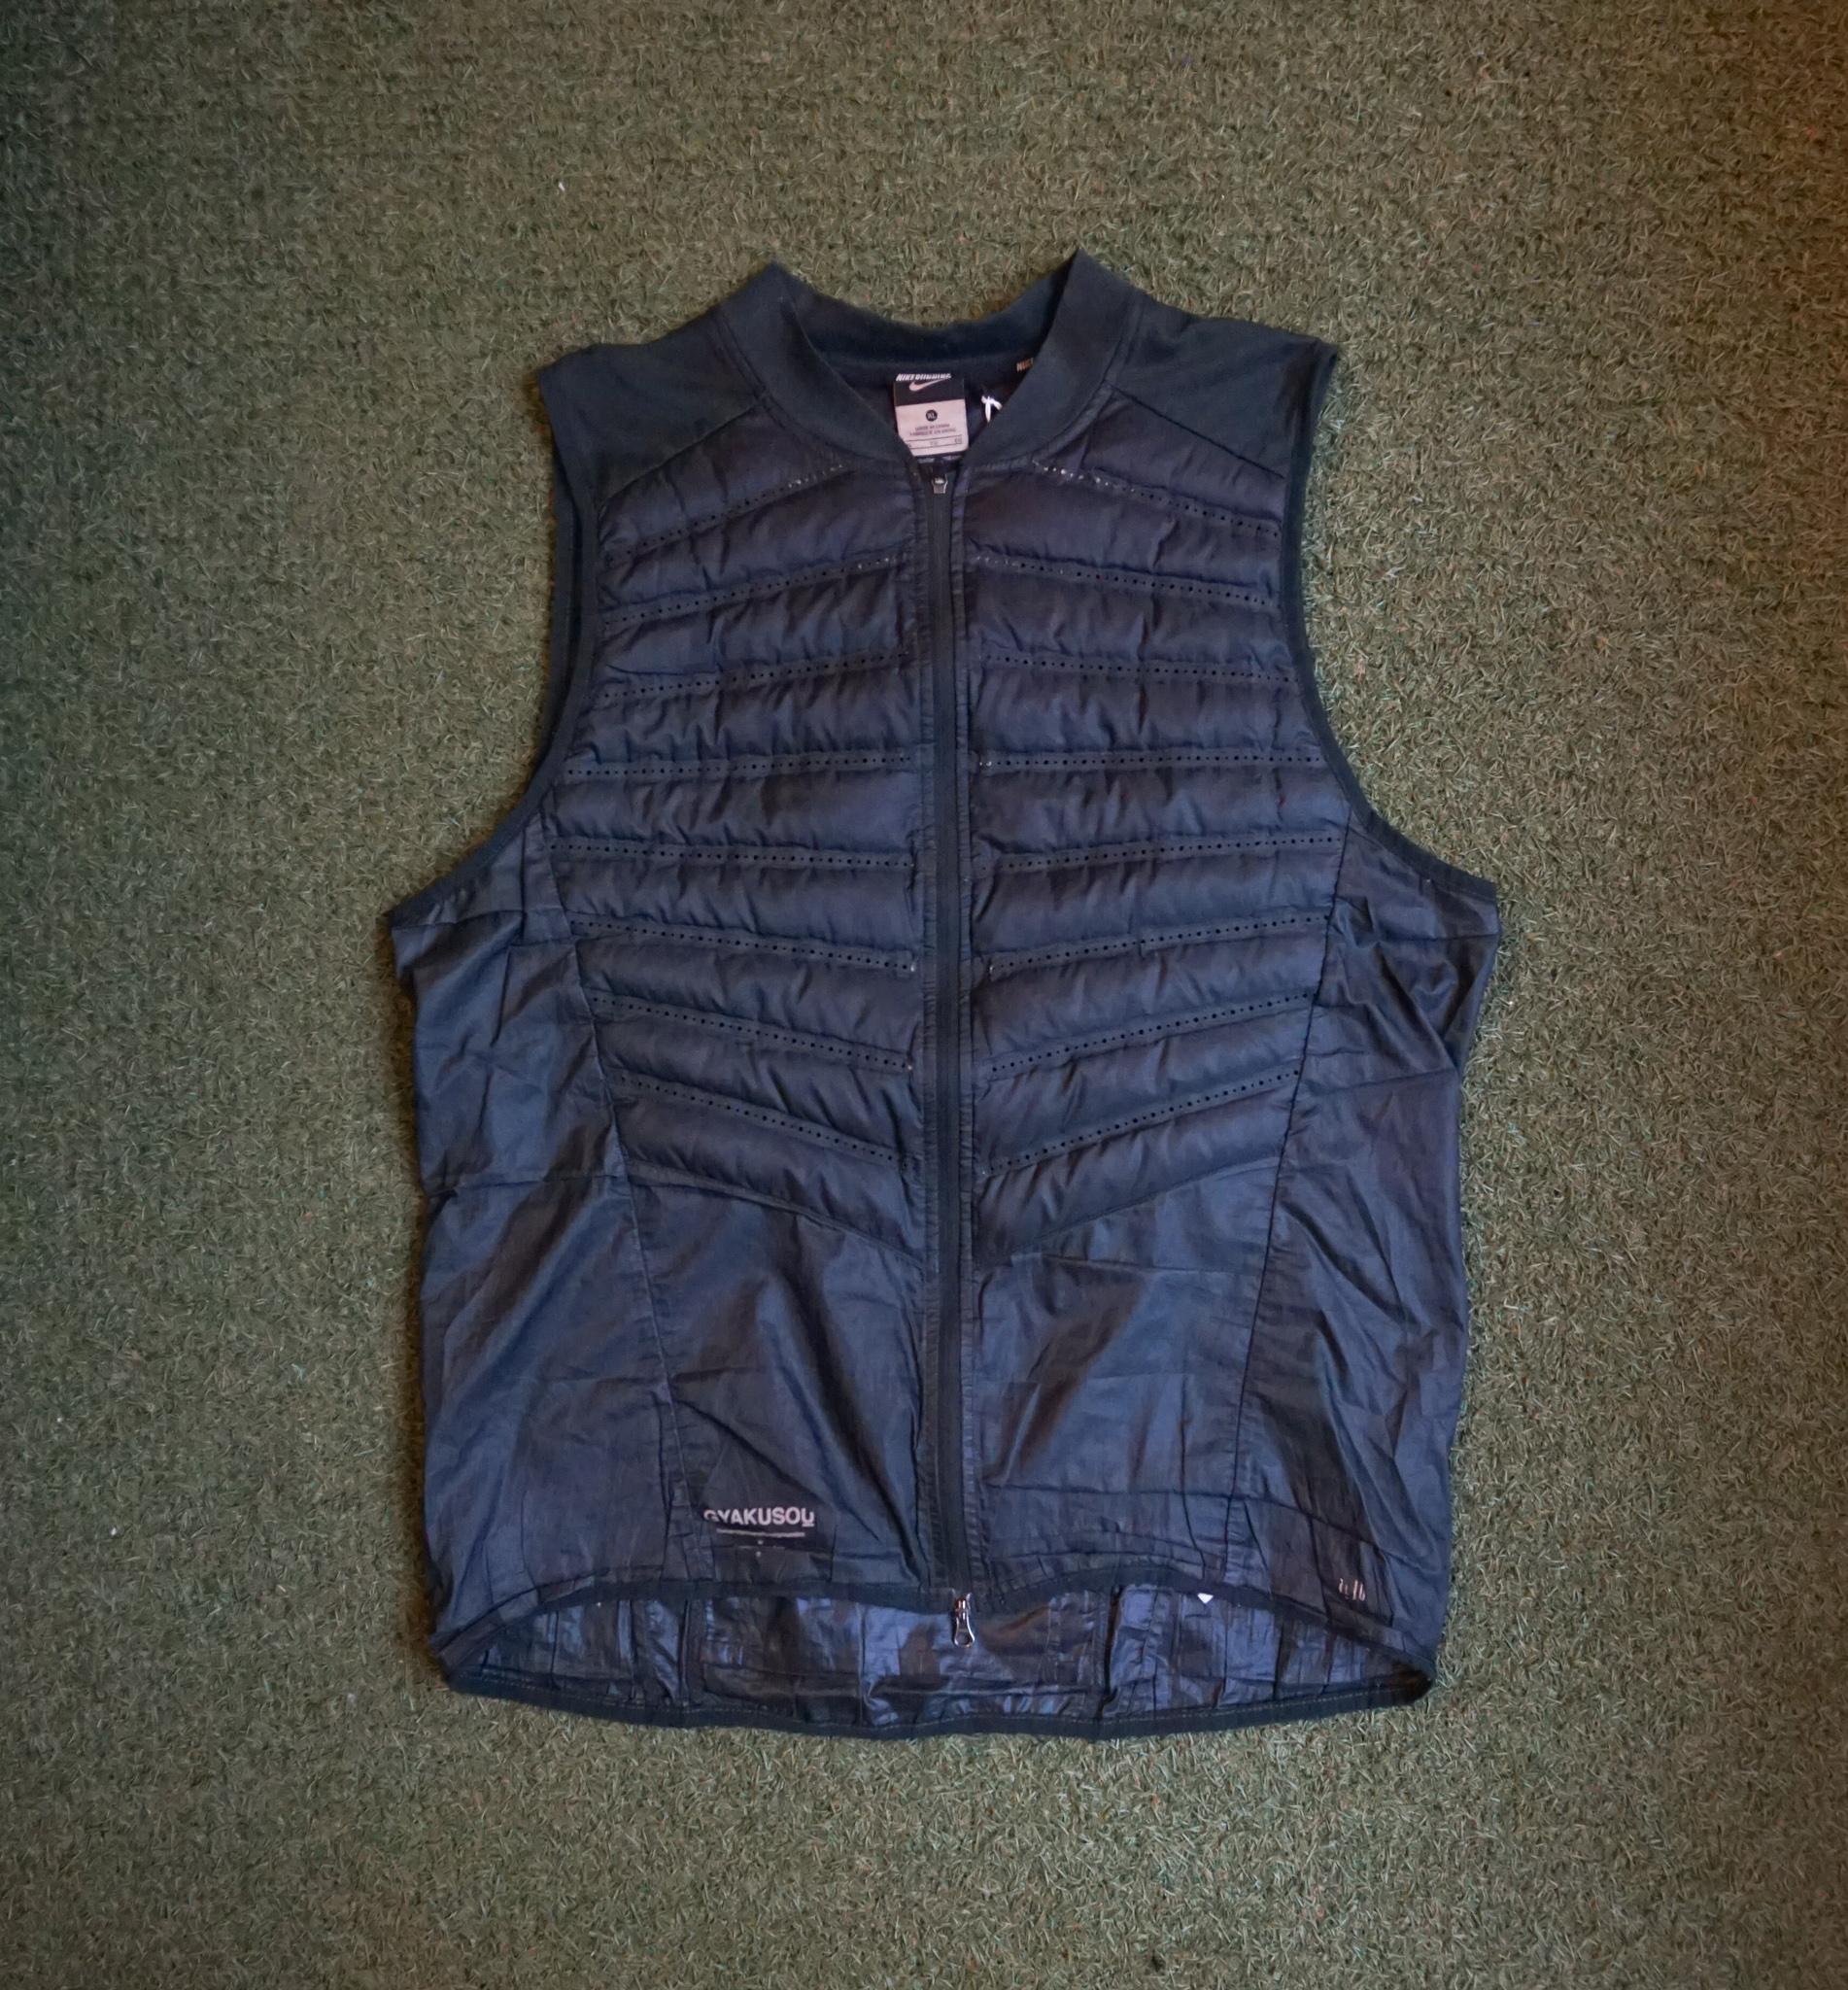 NikeLab x Undercover Vest